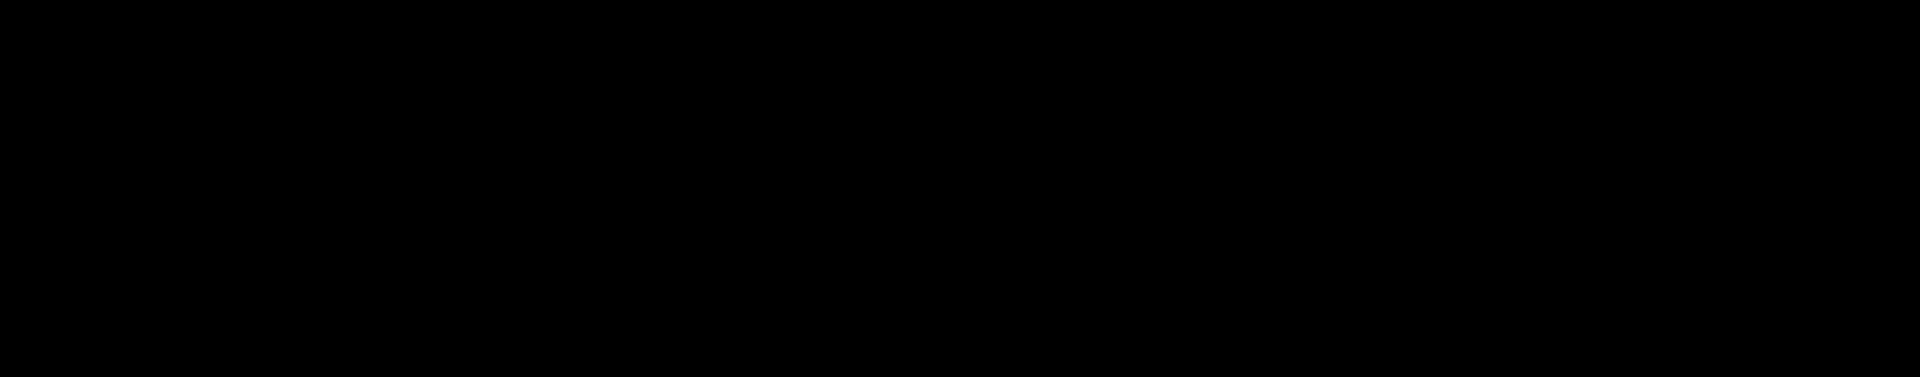 Evans Moore and Associates logo